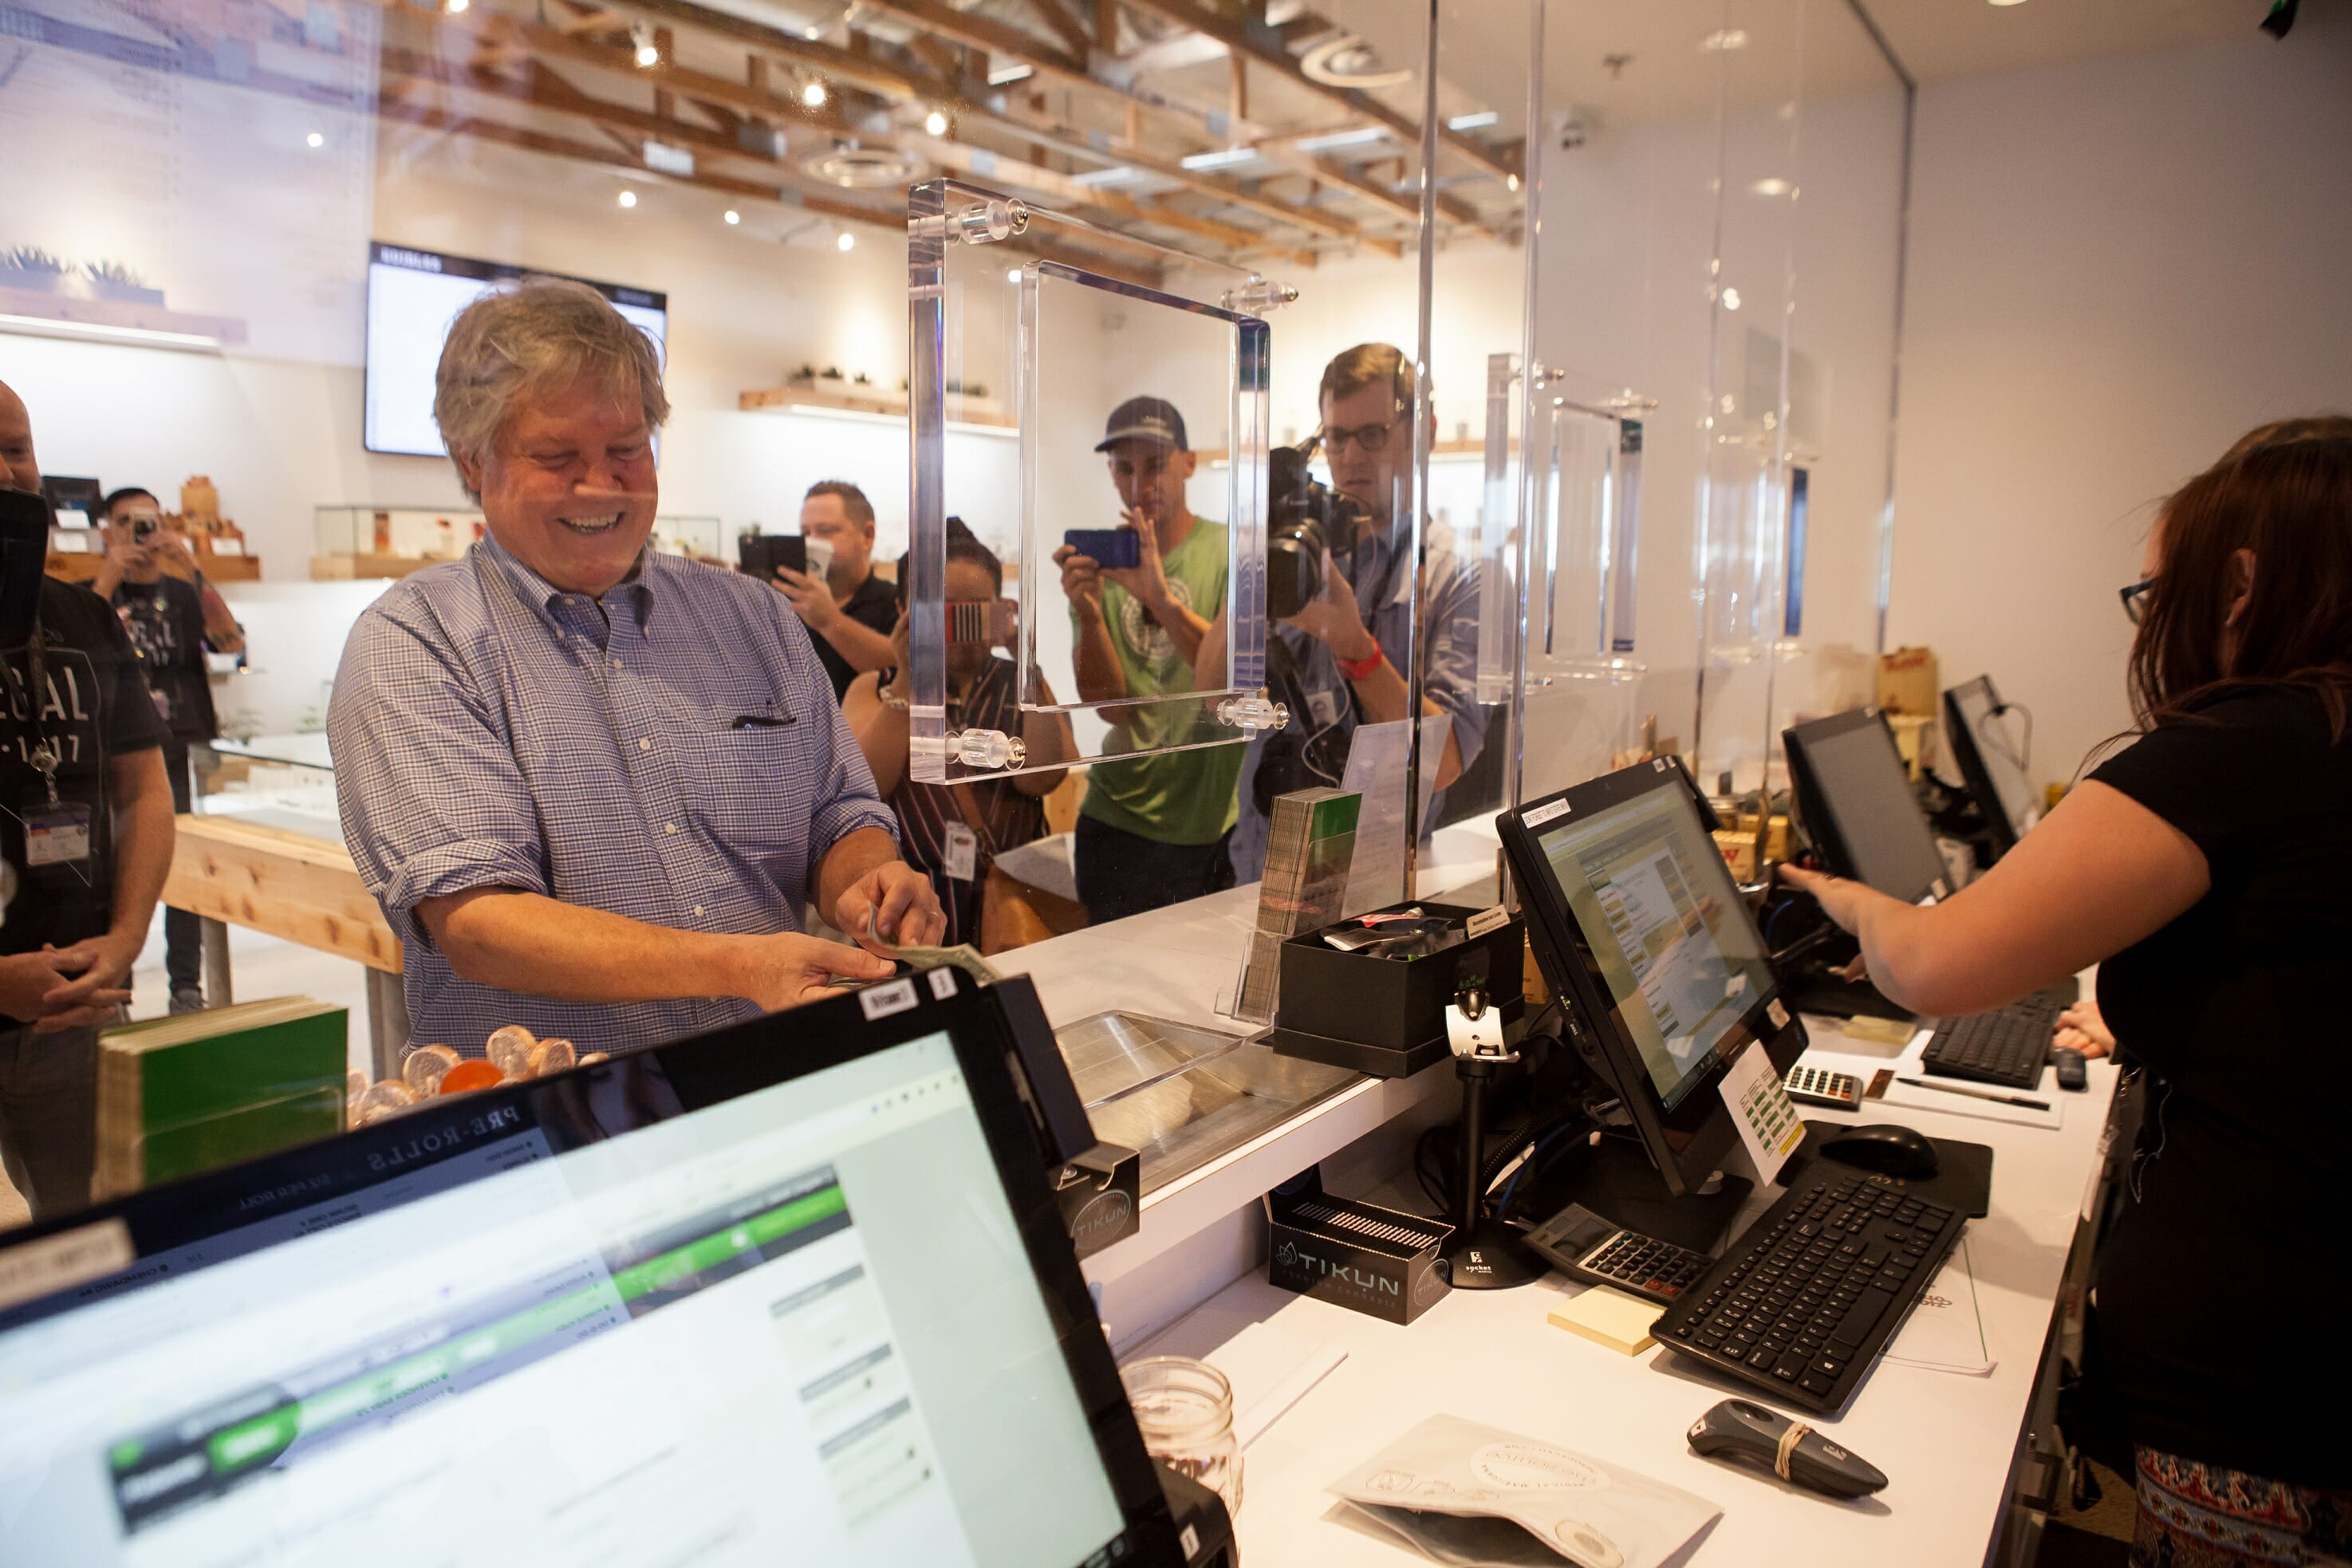 Senator Tick Segerblom standing in front of a cash register